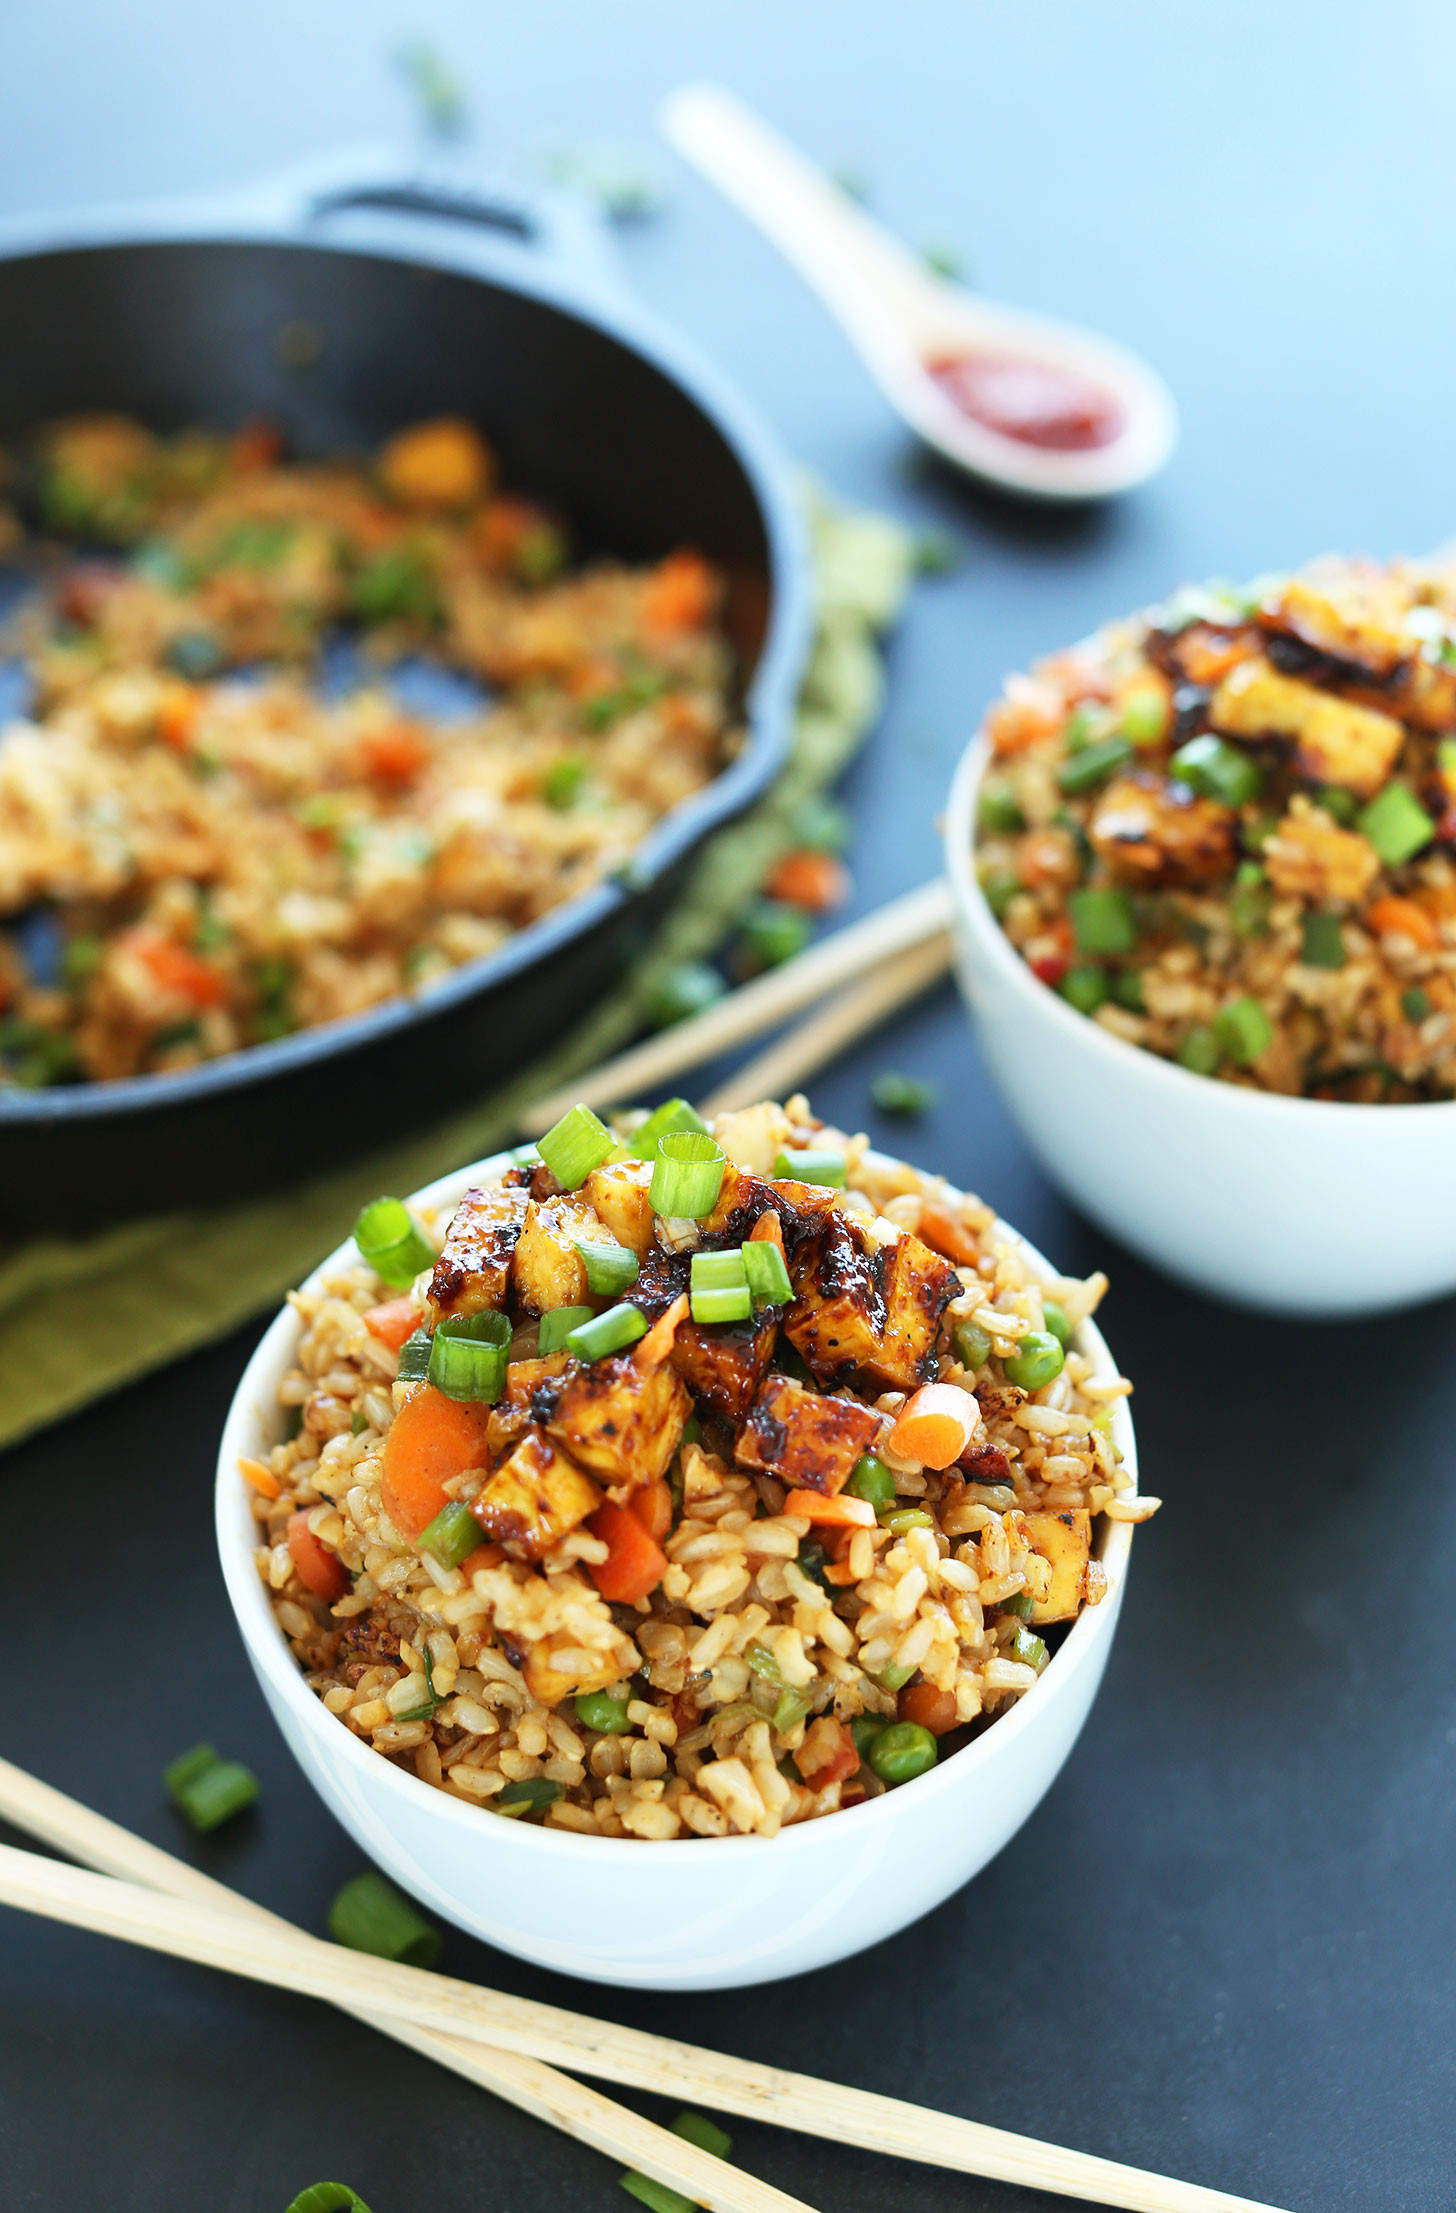 Simple Vegan Recipes  ve arian recipes easy